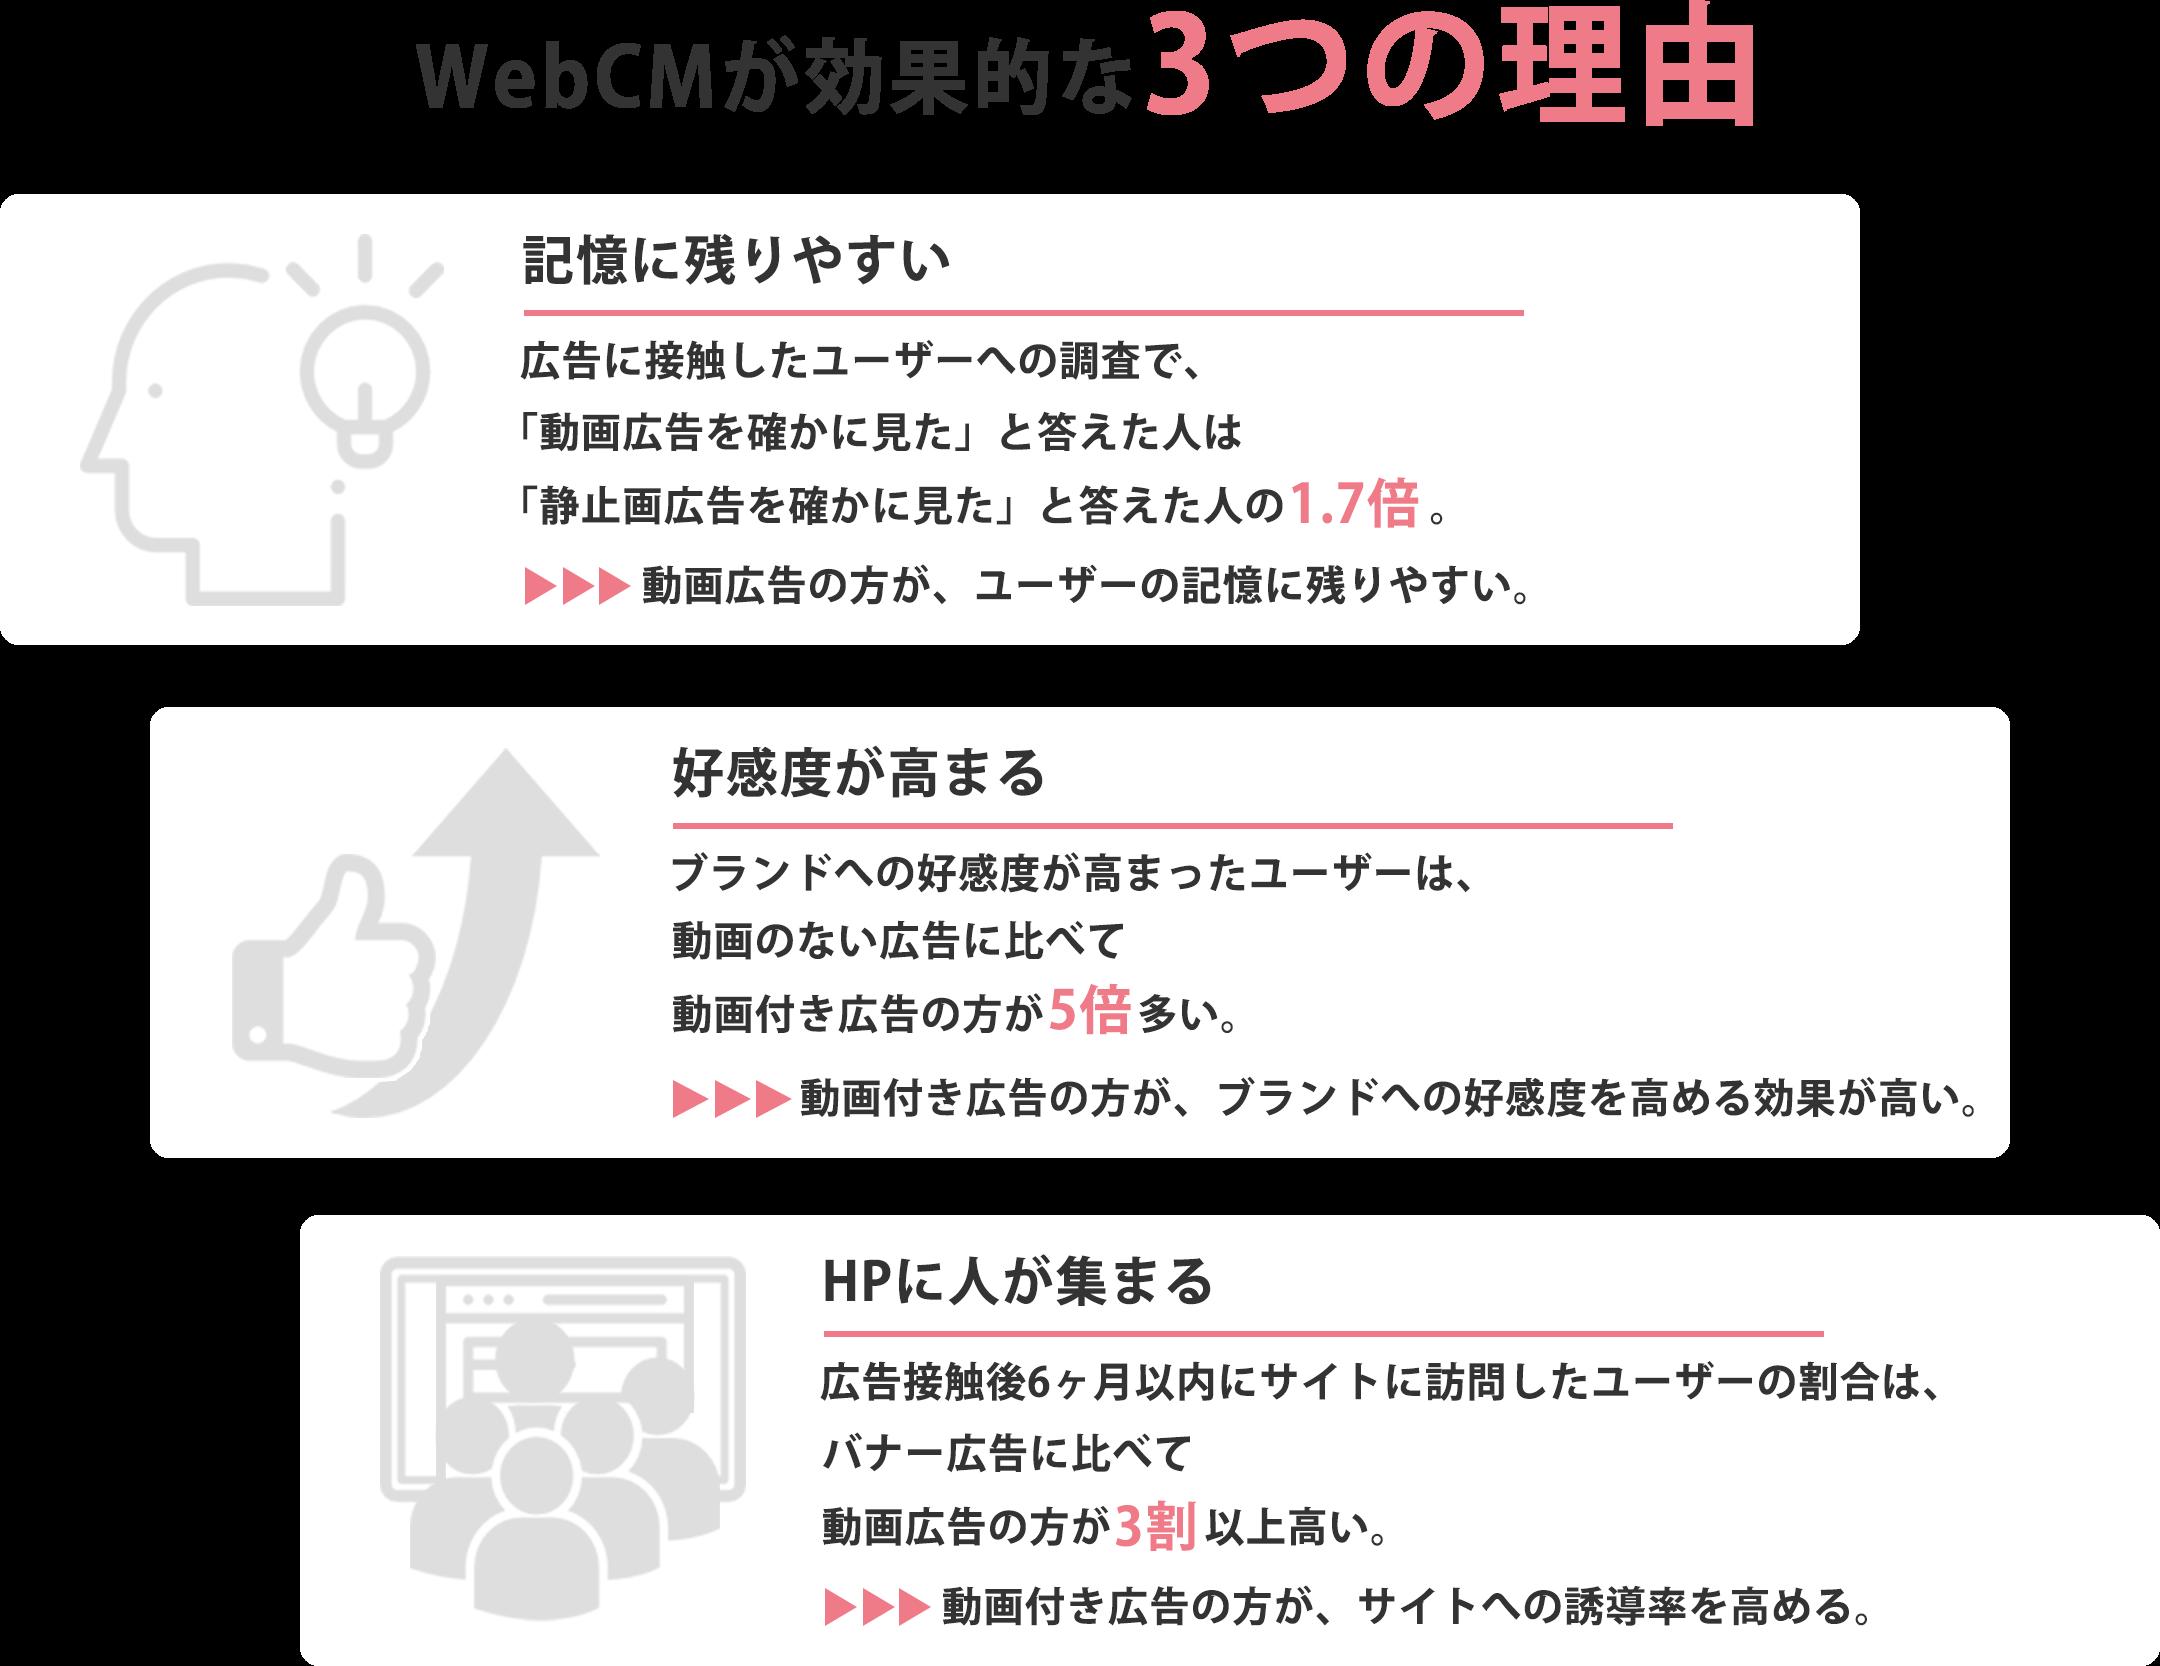 WebCMが効果的な3つの理由